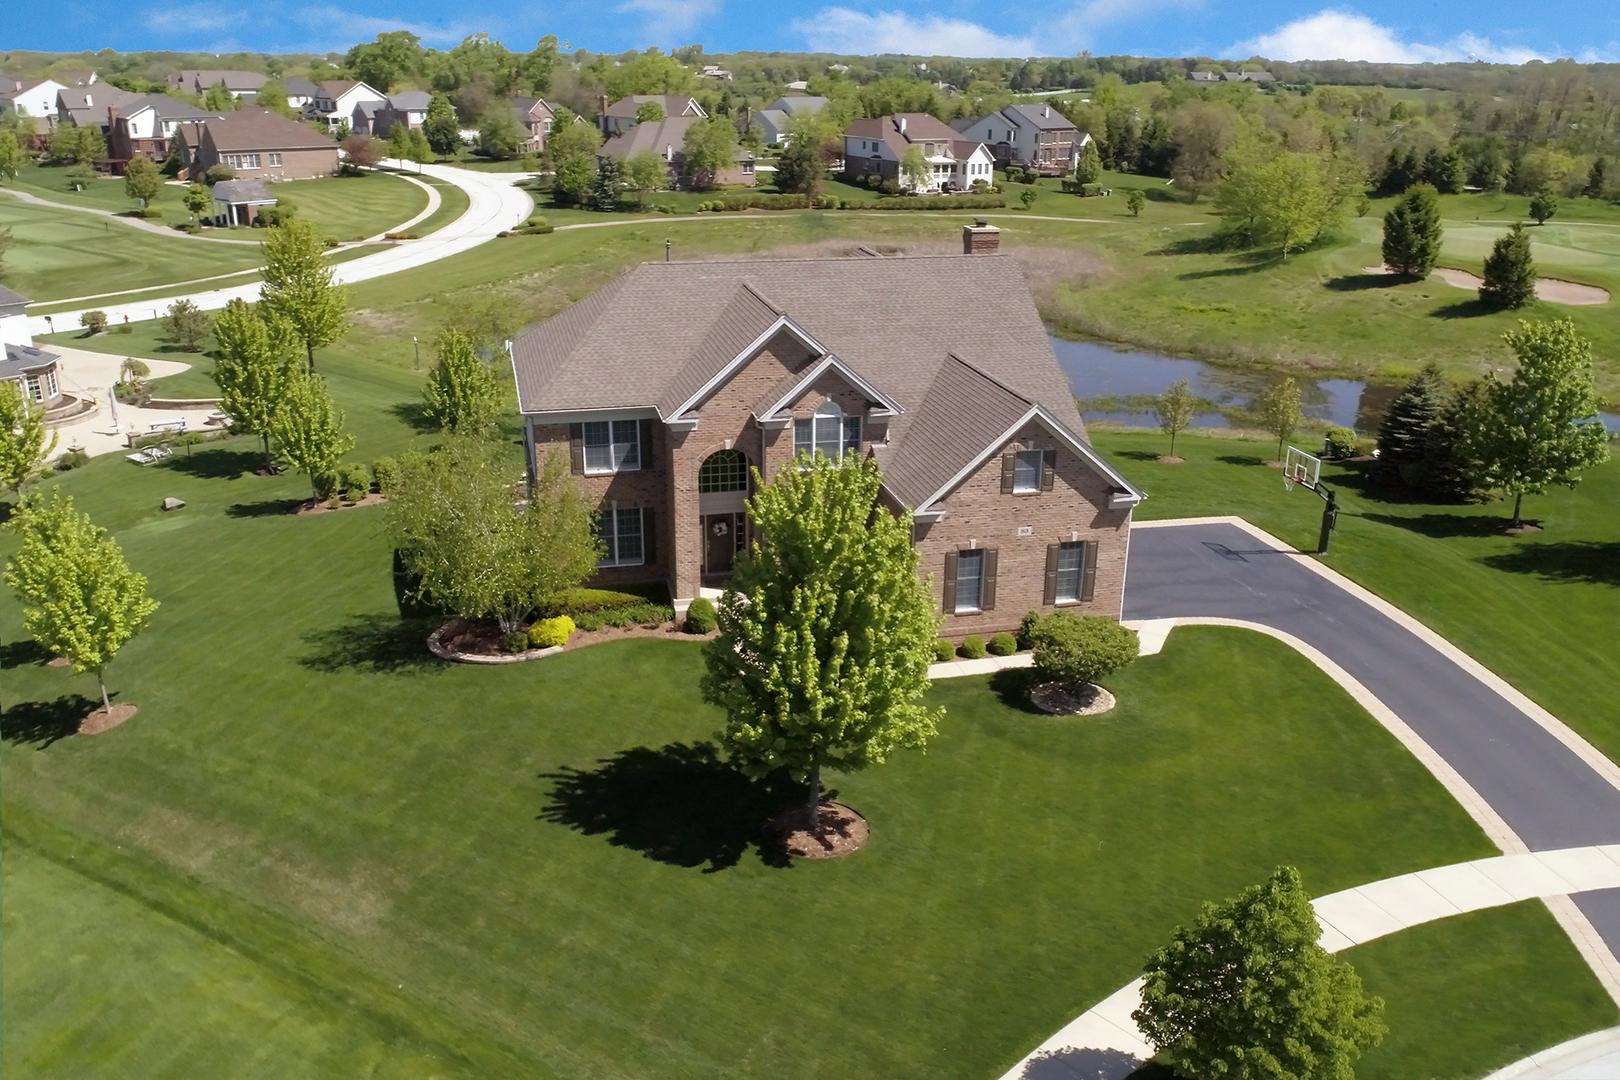 83 Tournament Drive, Hawthorn Woods, Illinois 60047